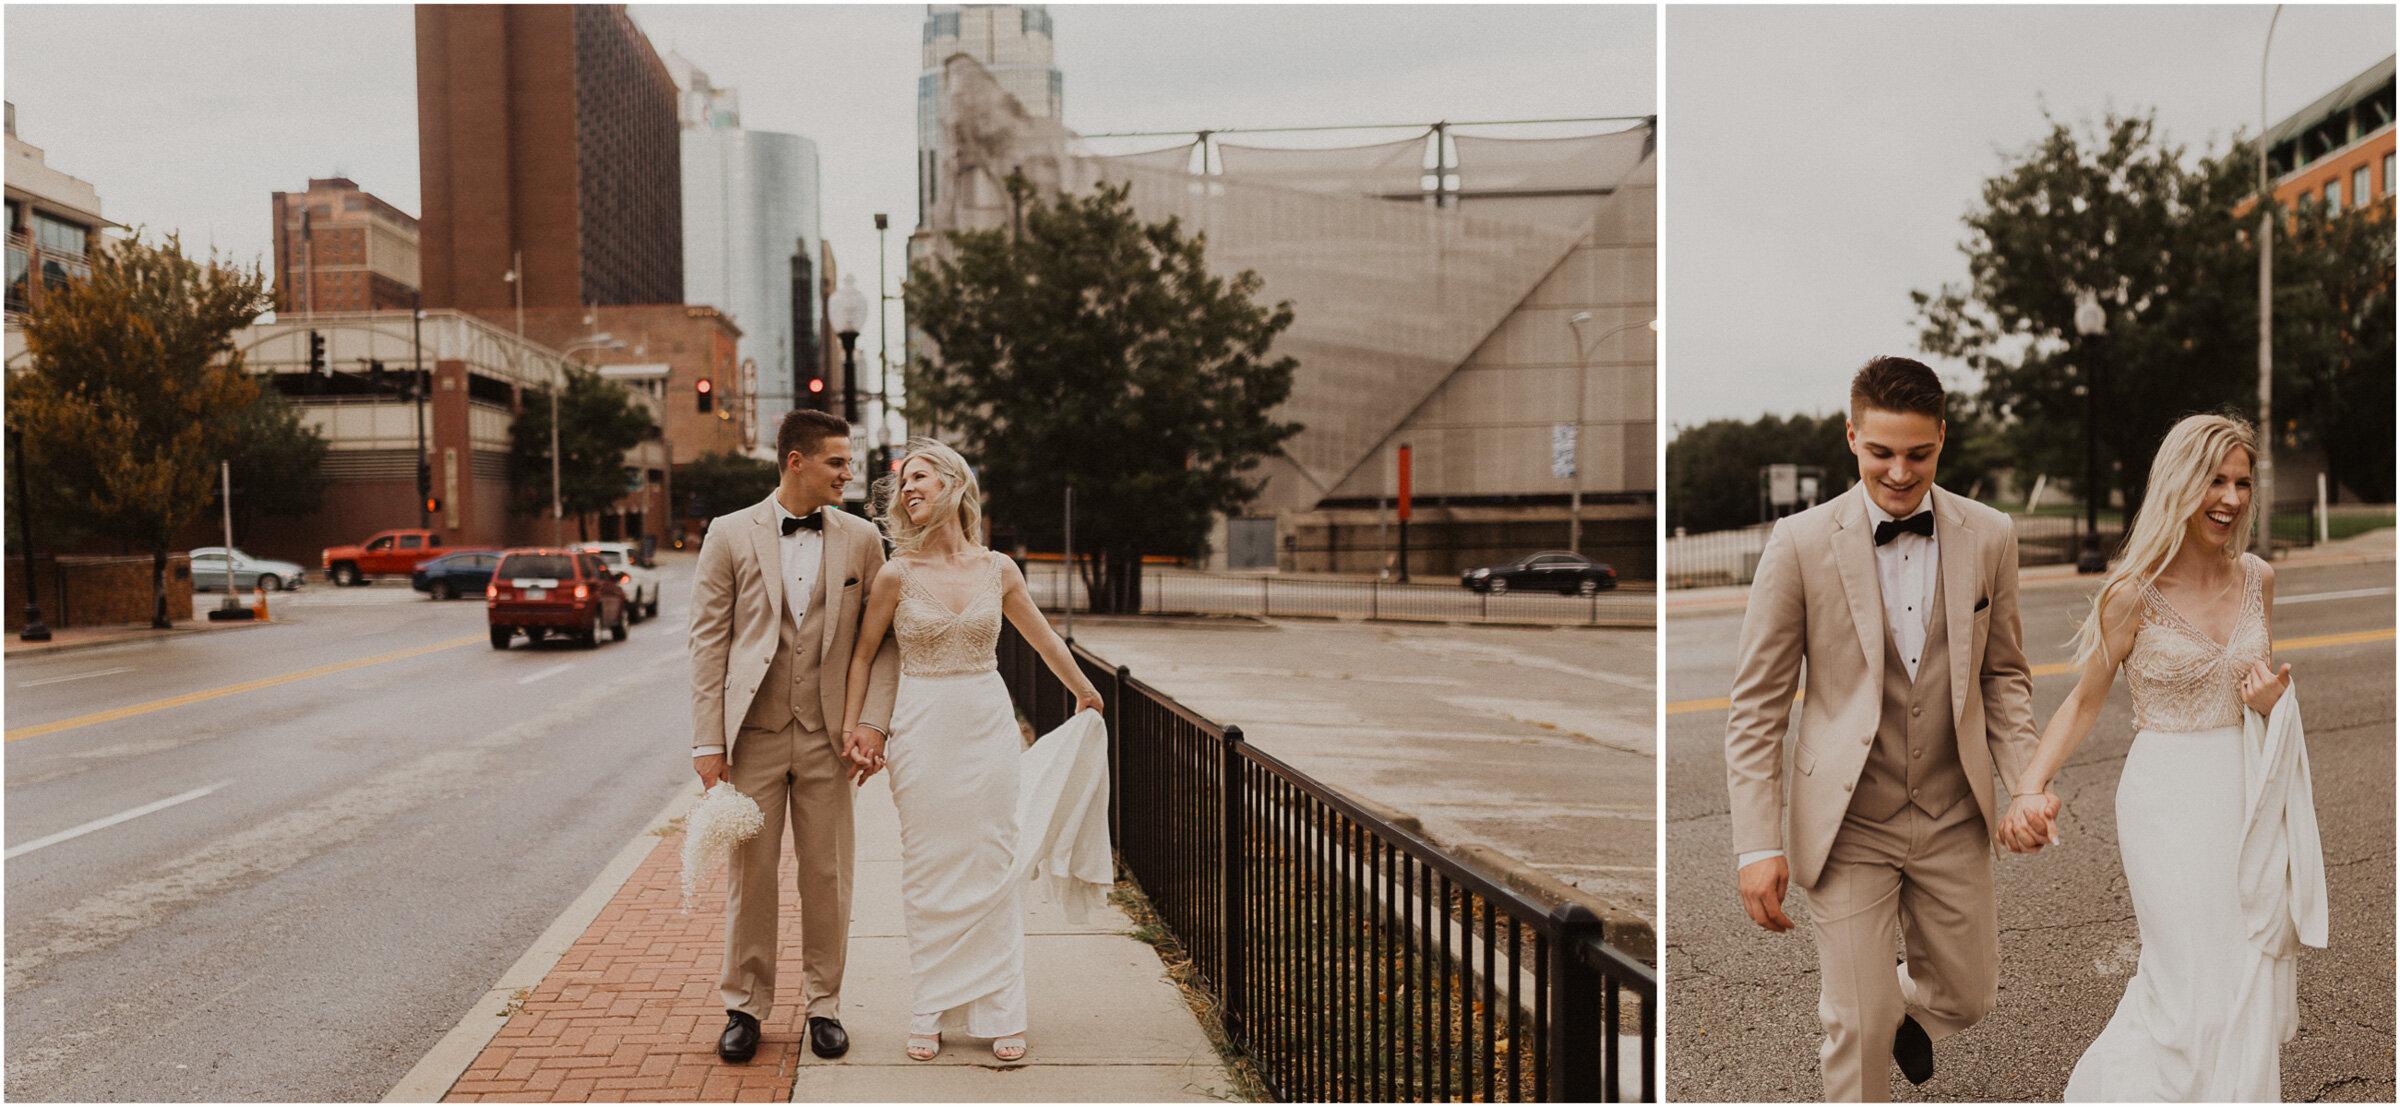 alyssa barletter photography downtown kansas city wedding boulevard brewery reception rainy day wedding-37.jpg